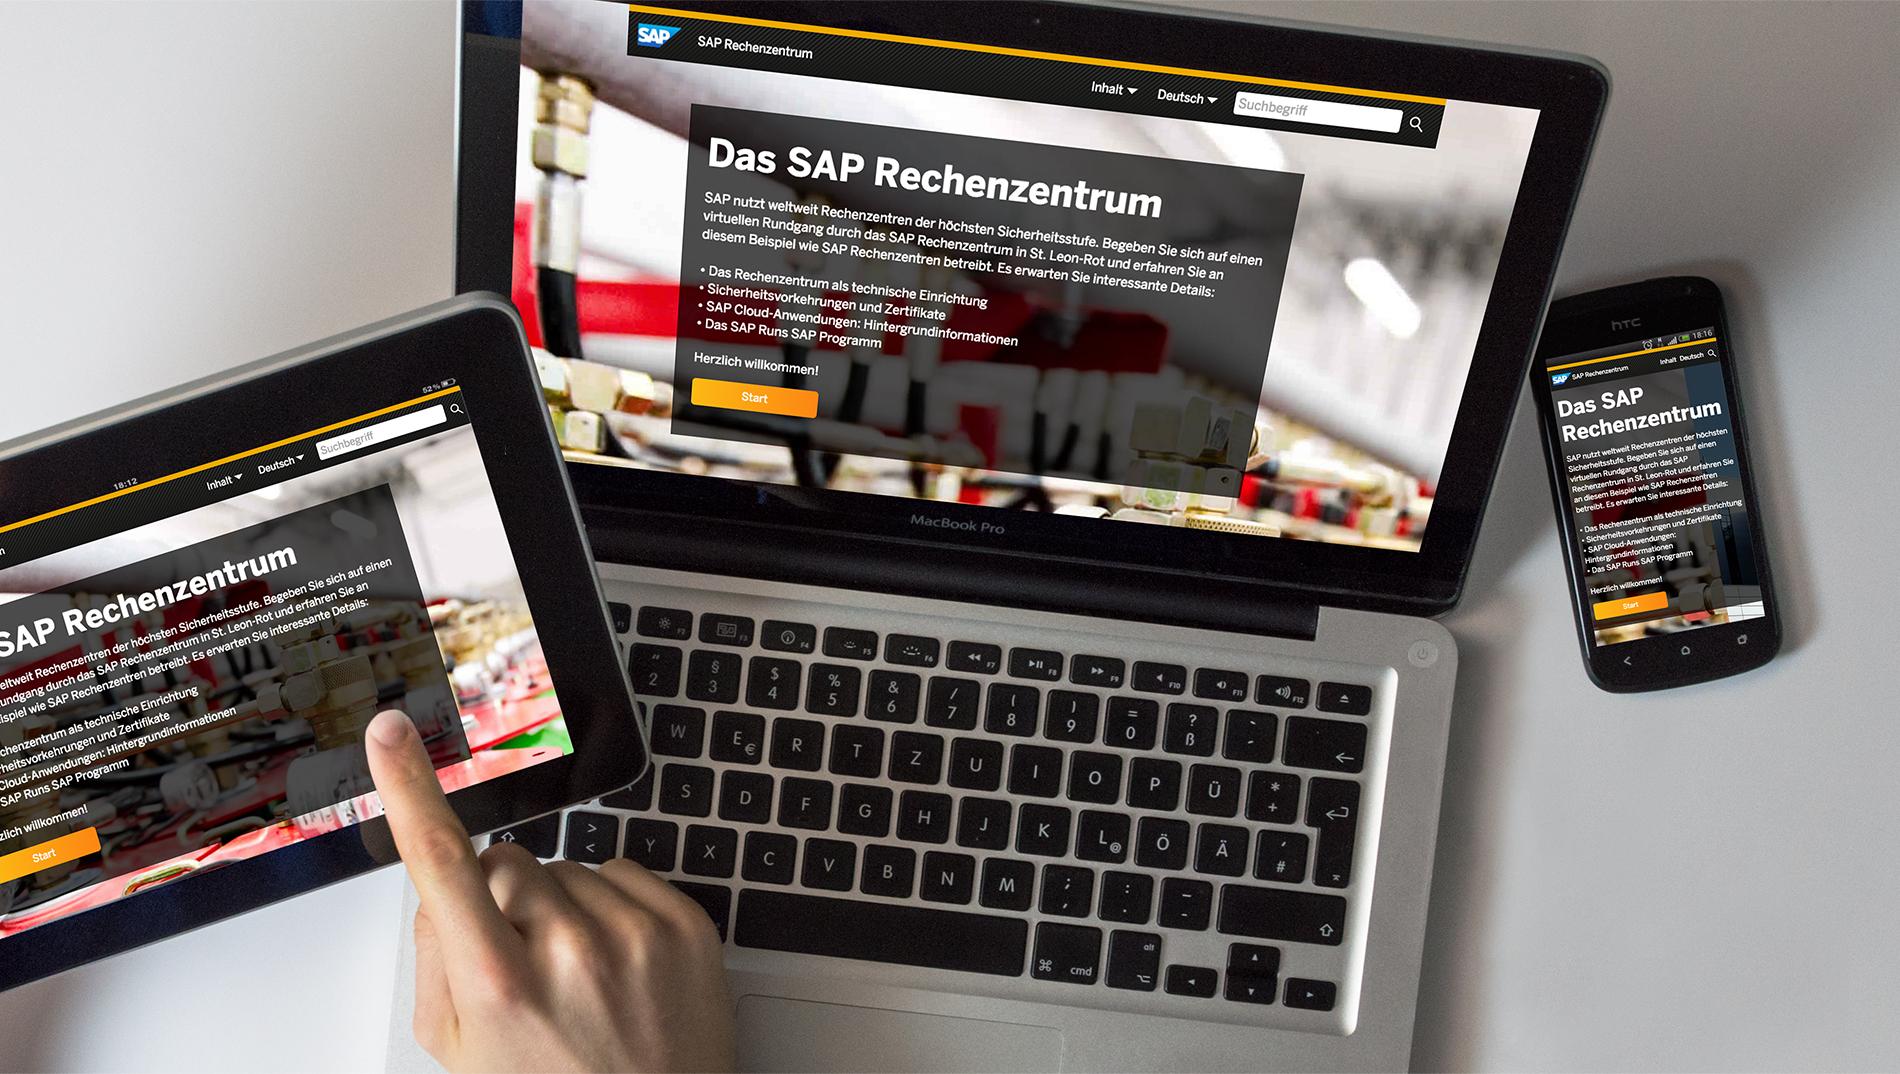 sap_devicesueberblick